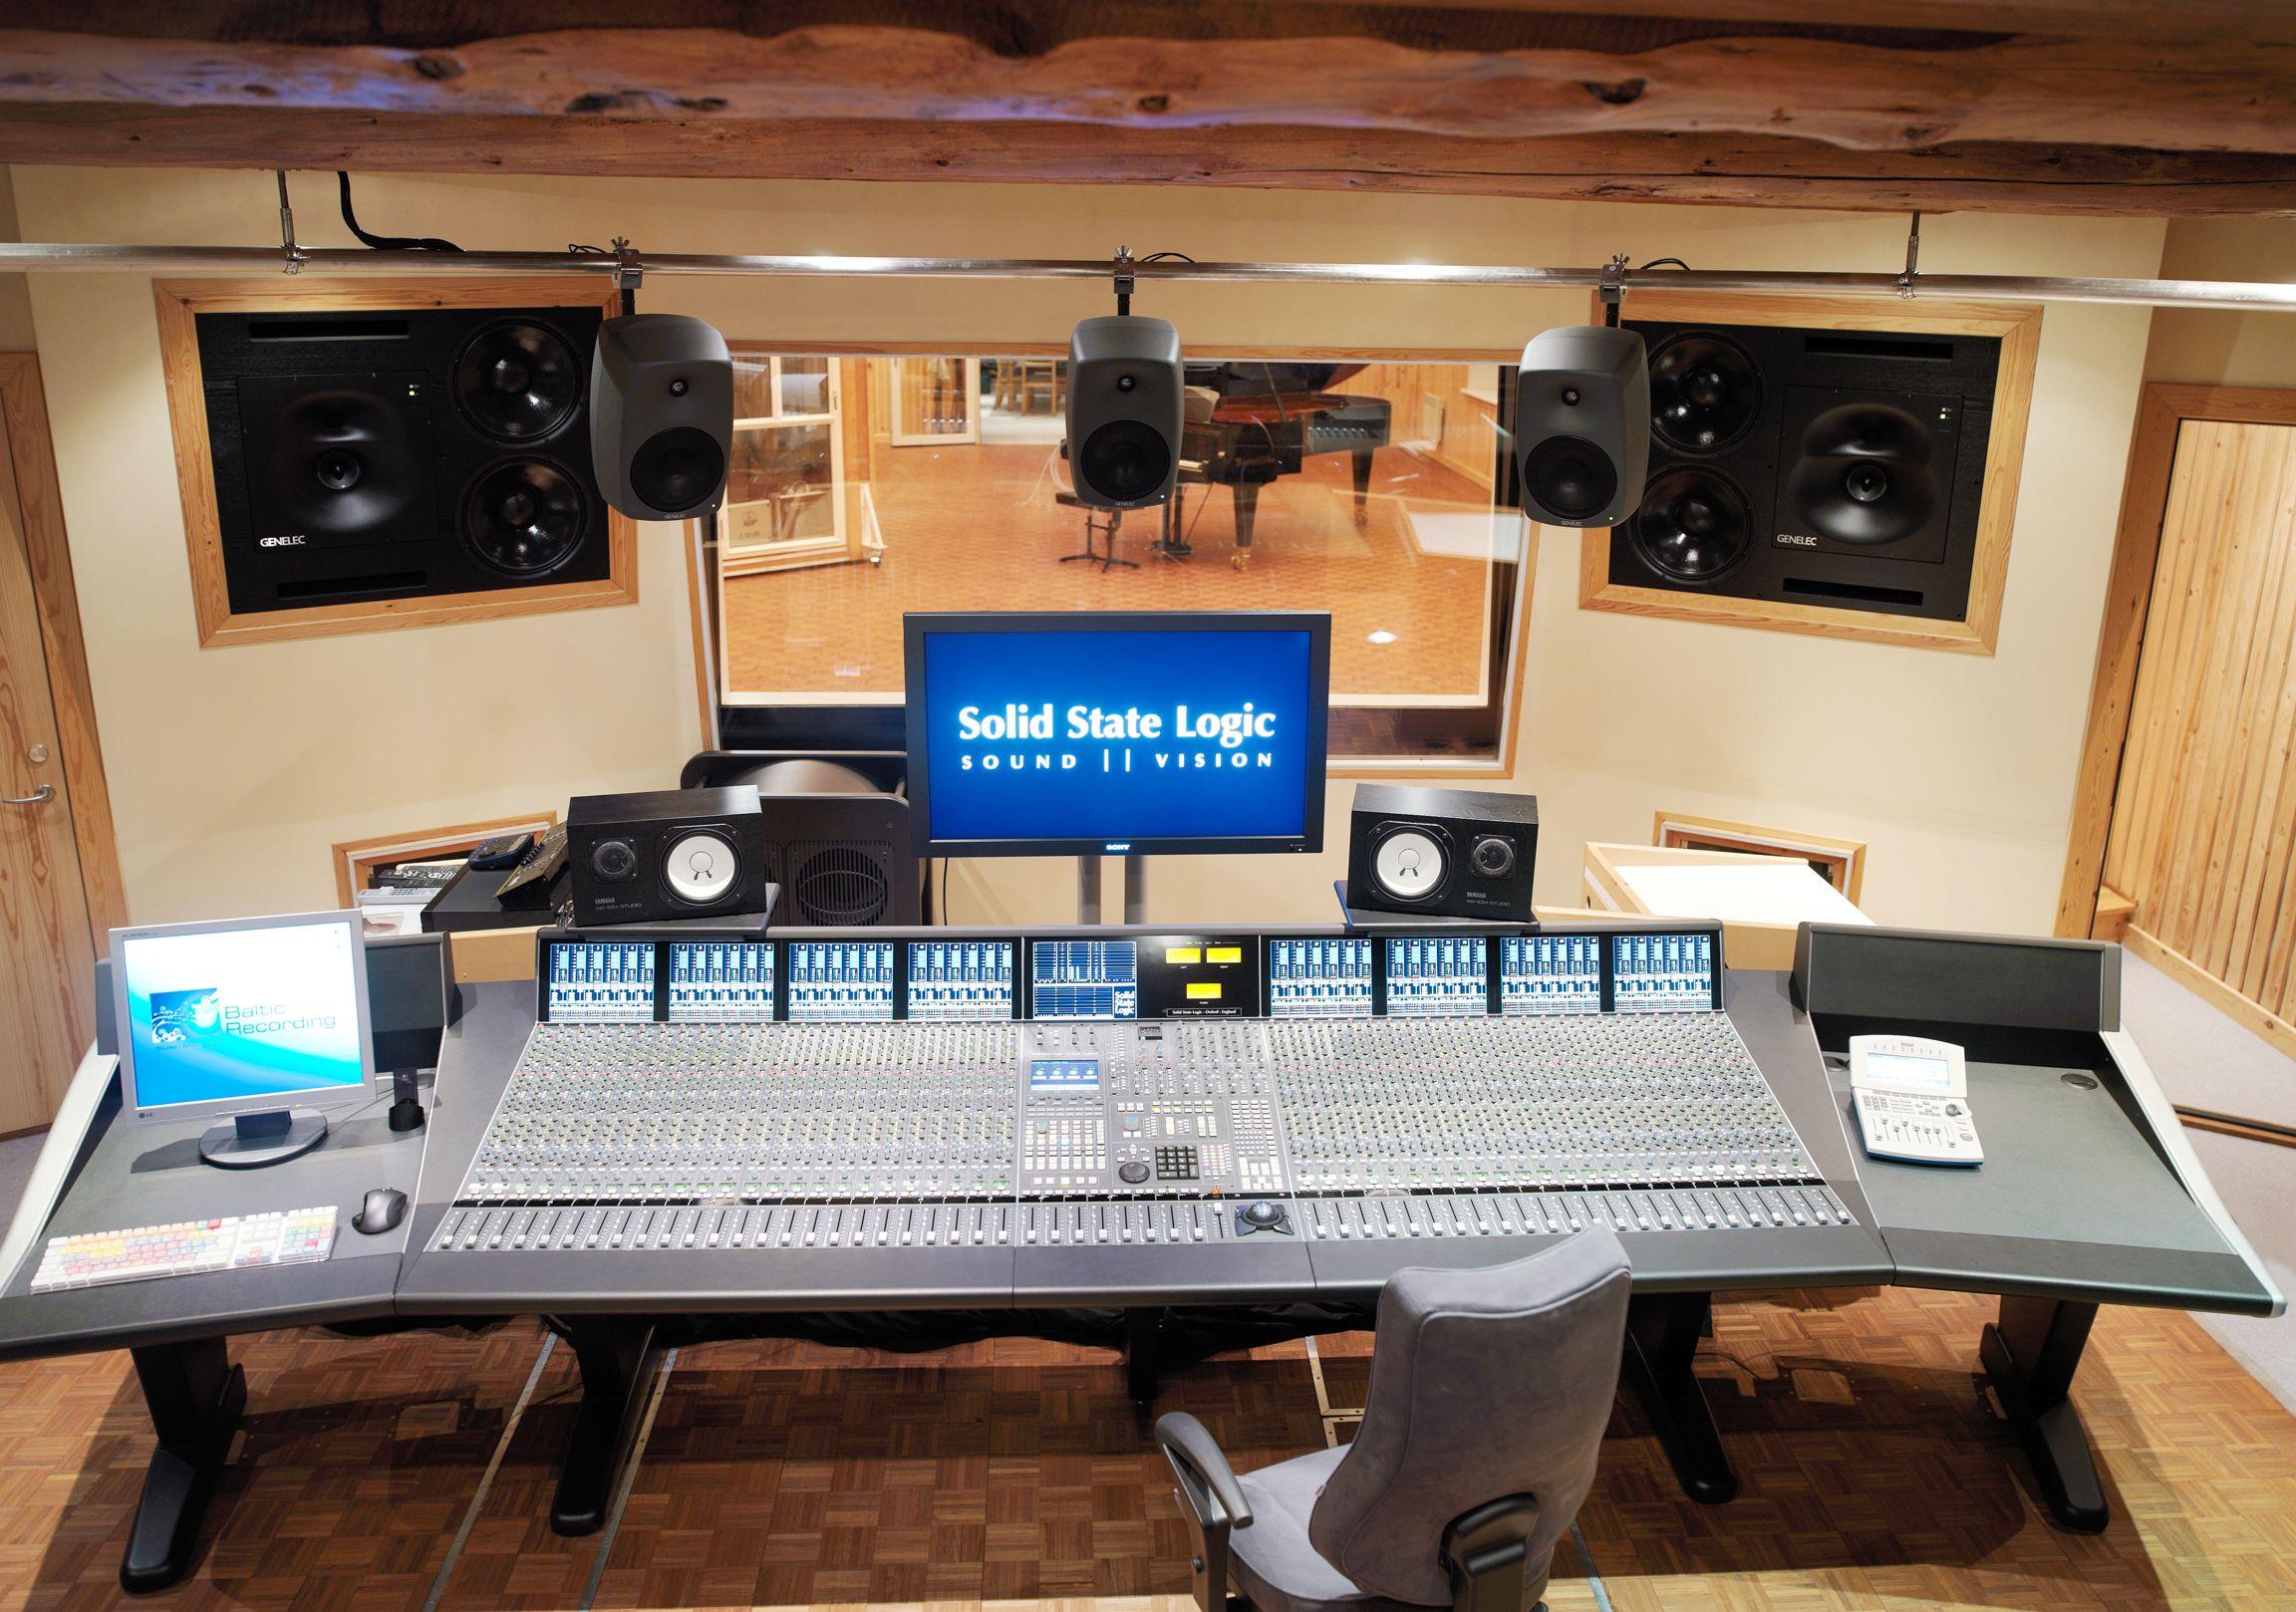 baltic recording studio denmark professional audio equipment in 2019 home studio music. Black Bedroom Furniture Sets. Home Design Ideas